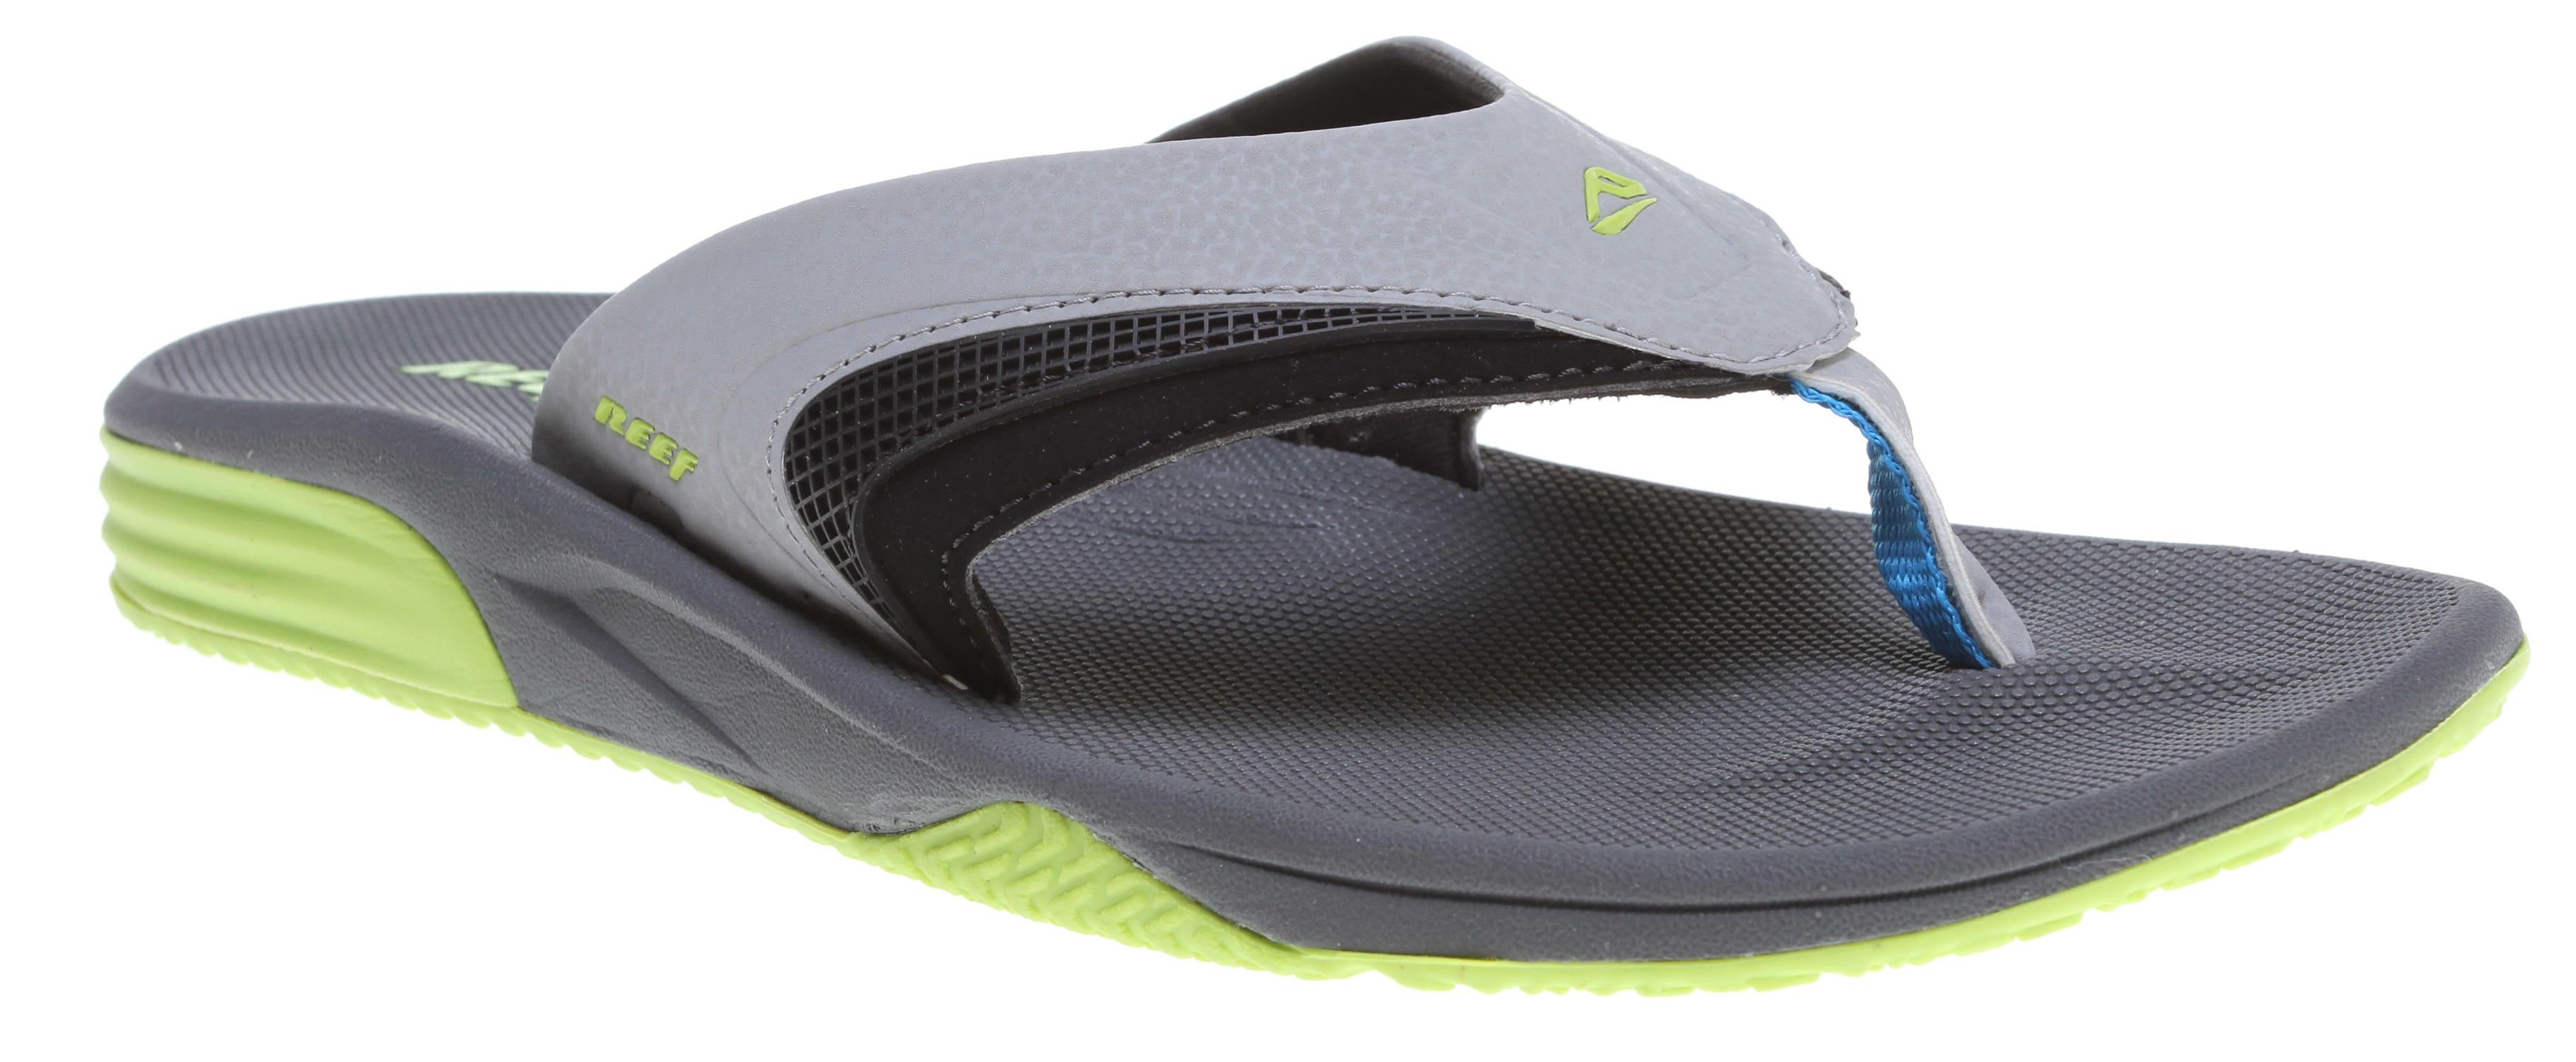 0669780dd846 Reef phantom player sandals thumbnail jpg 3637x1500 Mens reef phantom  player sandal